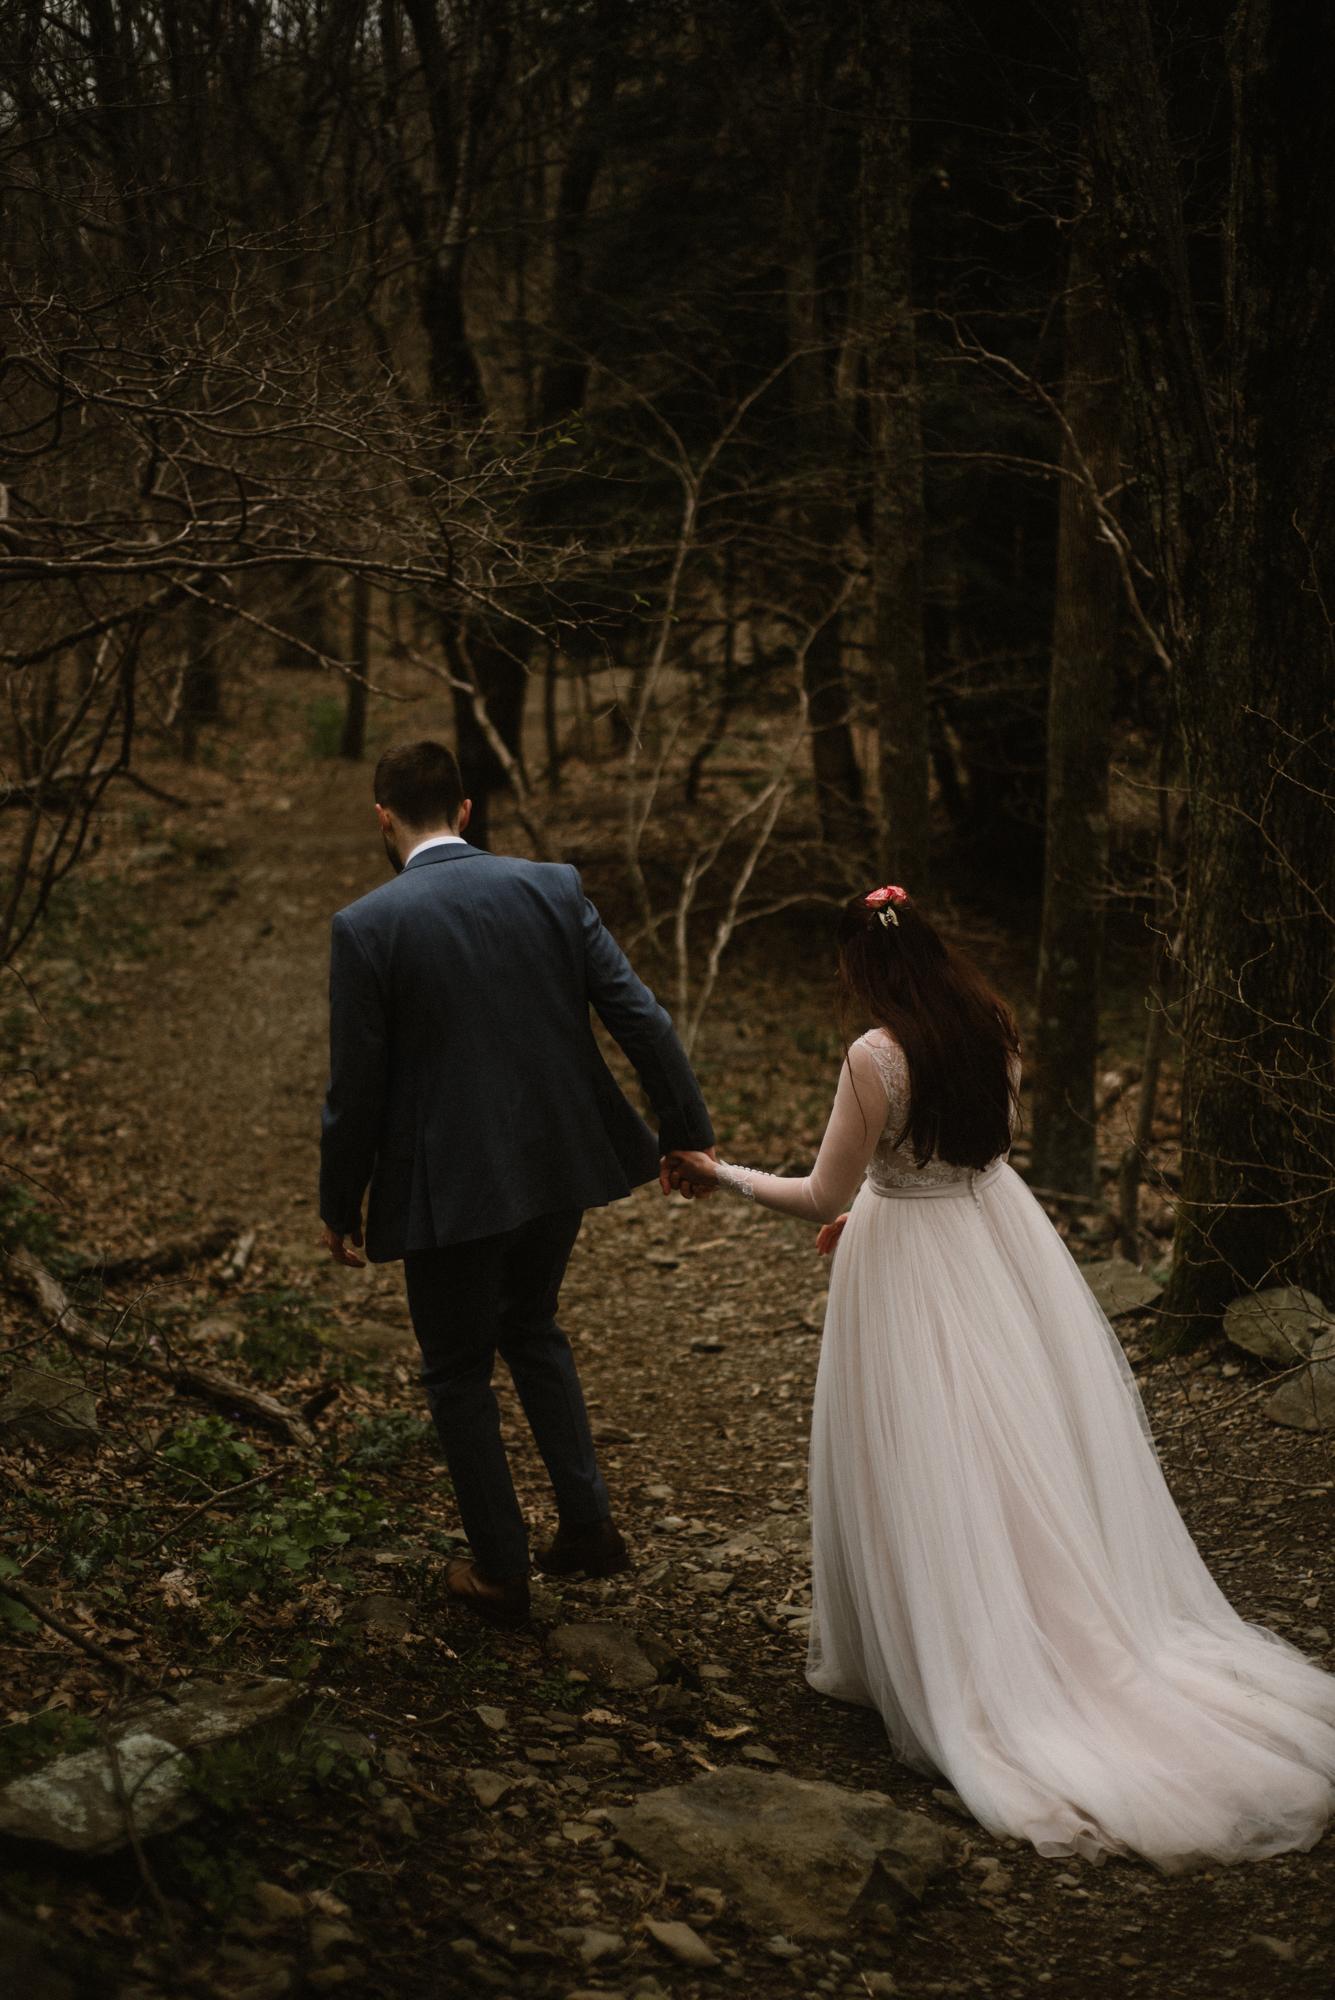 Paula and Andrew - Small Adventurous Wedding in Shenandoah National Park - Blue Ridge Mountain Wedding - White Sails Creative - Mountain Elopement_47.jpg